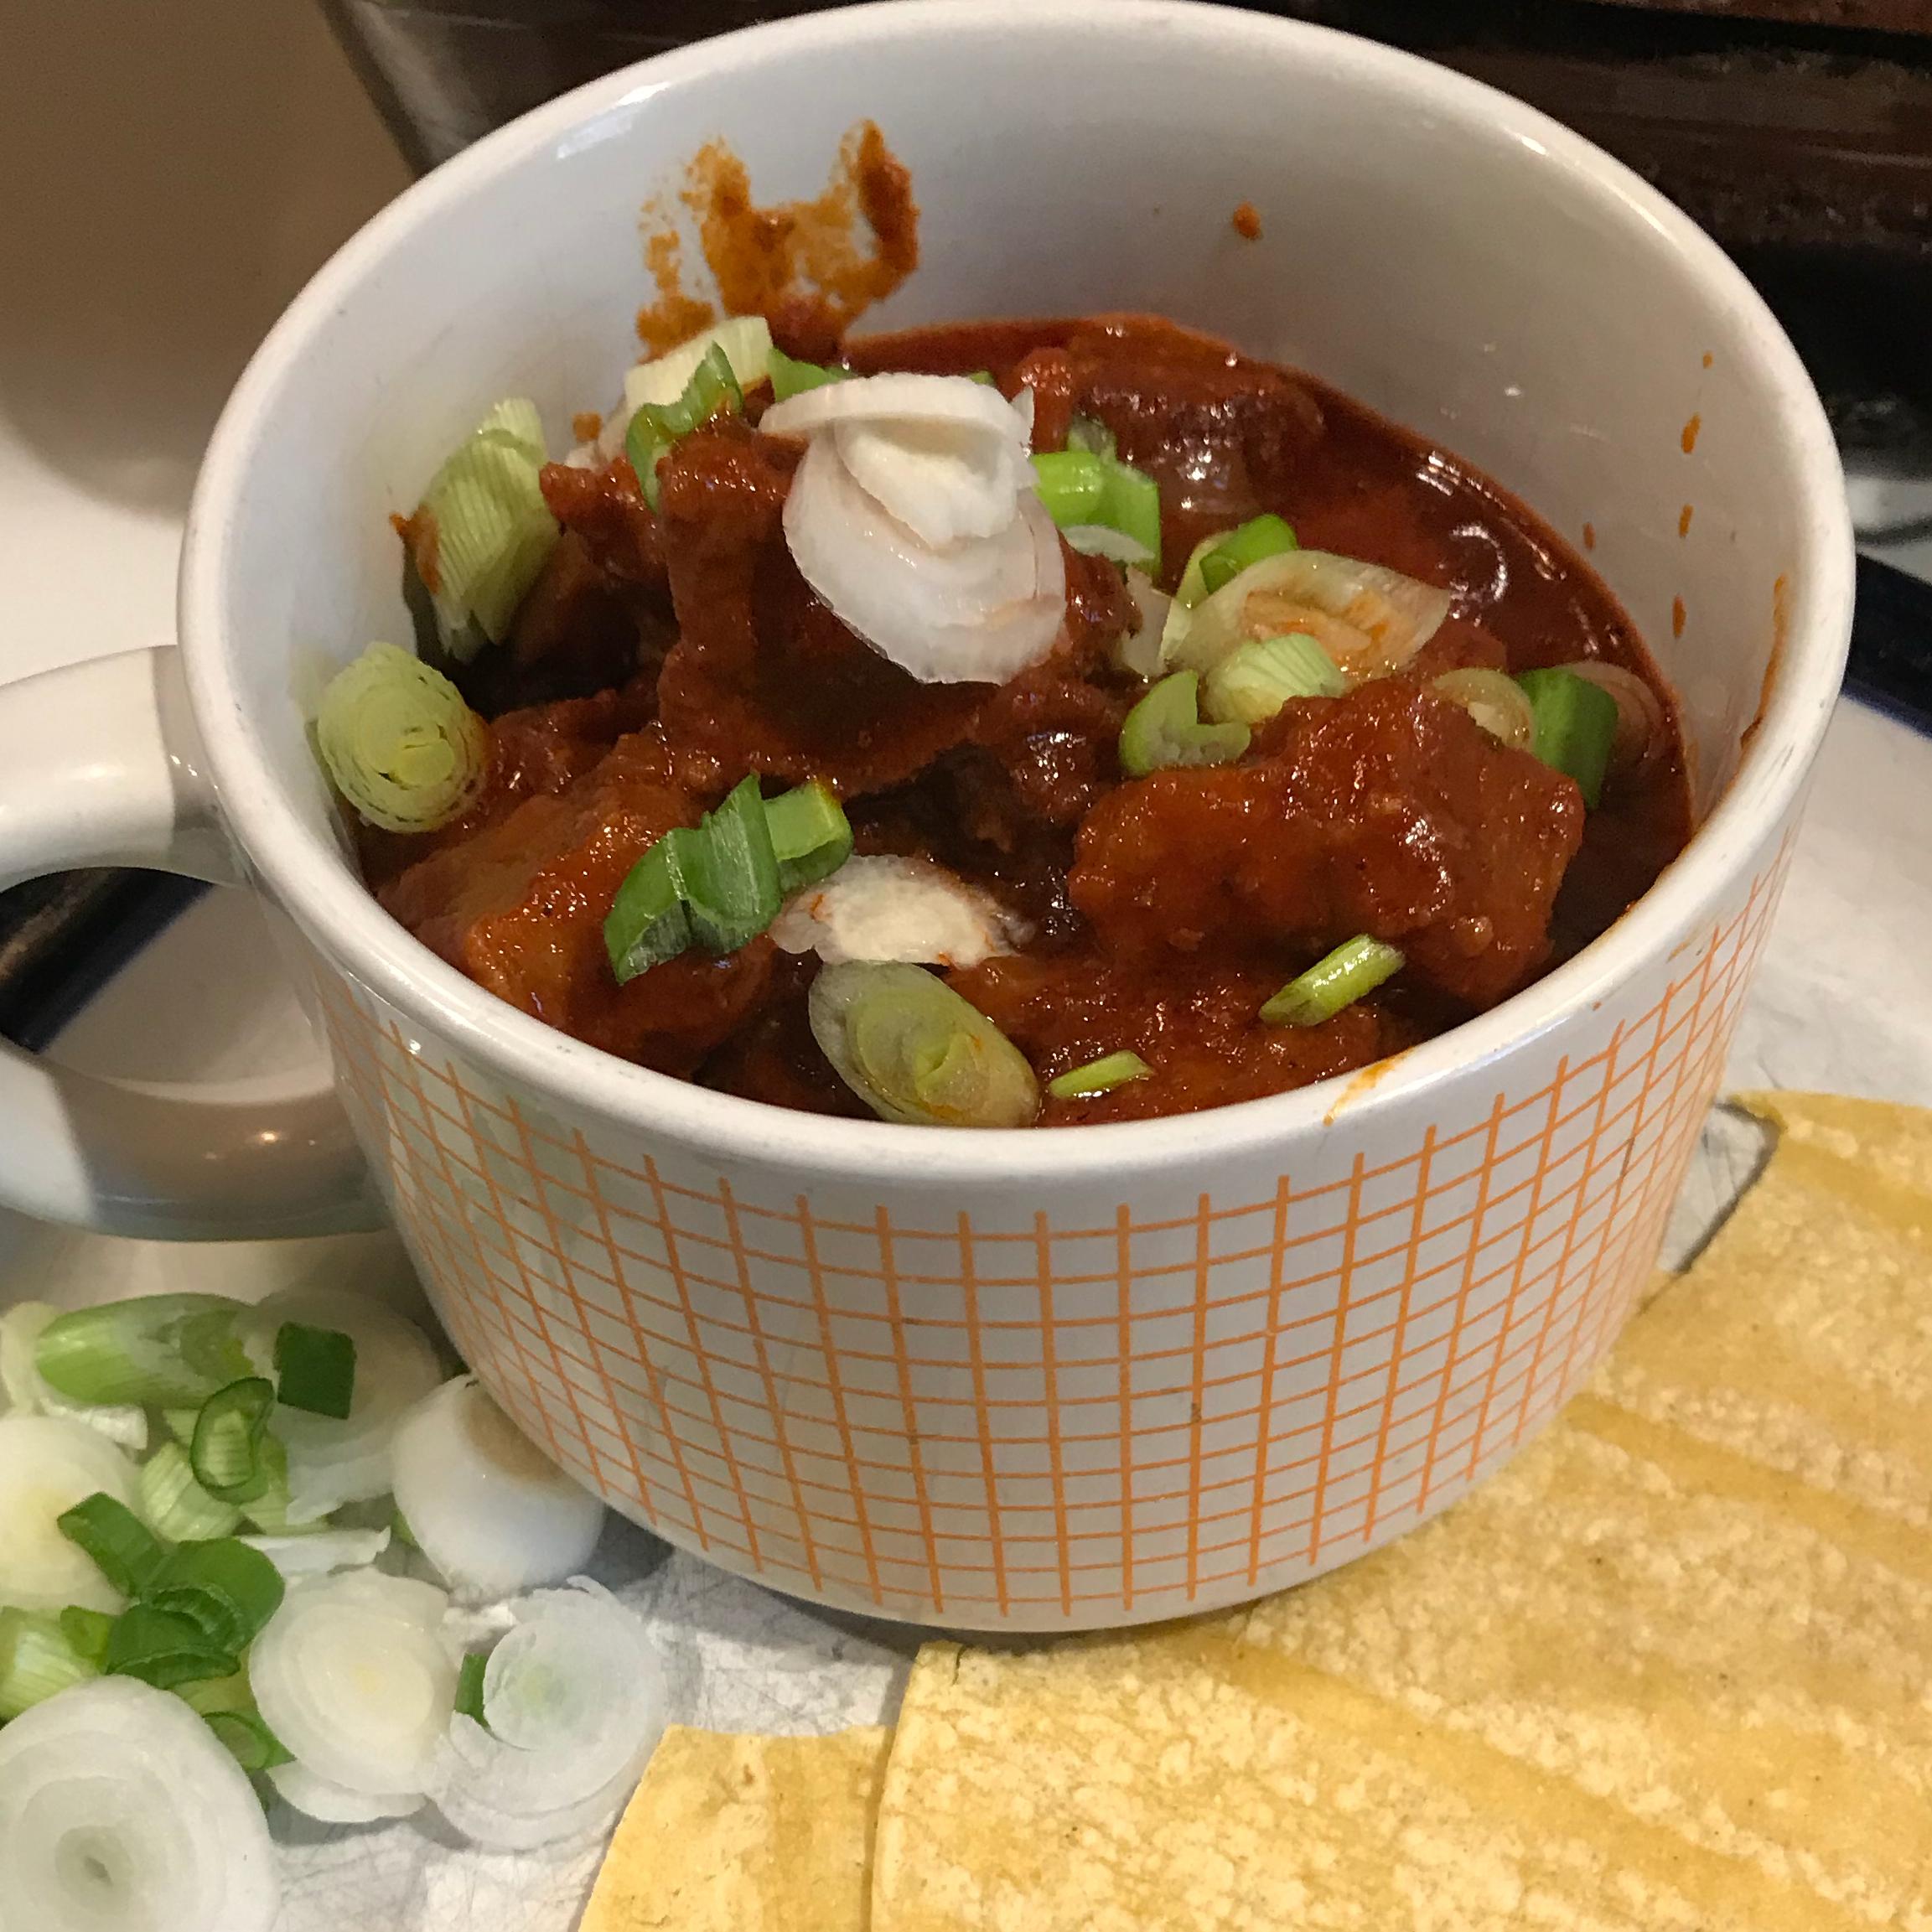 Instant Pot® Carne Adovado sdbadham